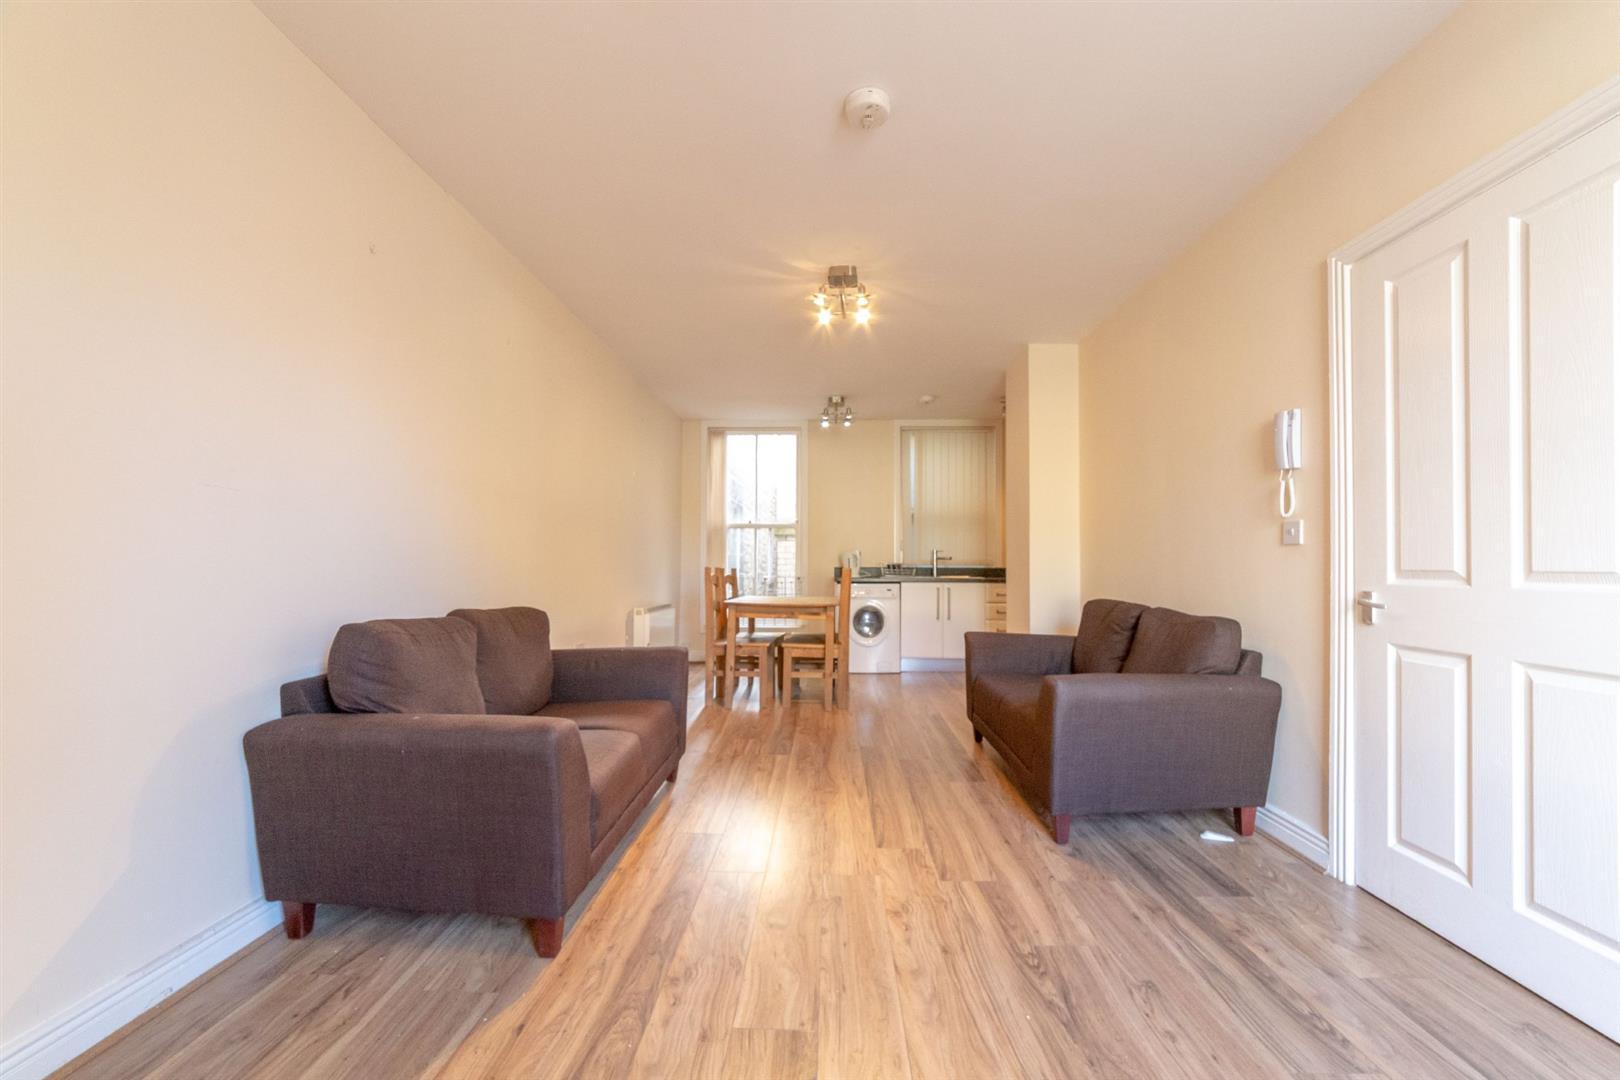 1 bed flat to rent in North Shields, NE30 1PW, NE30